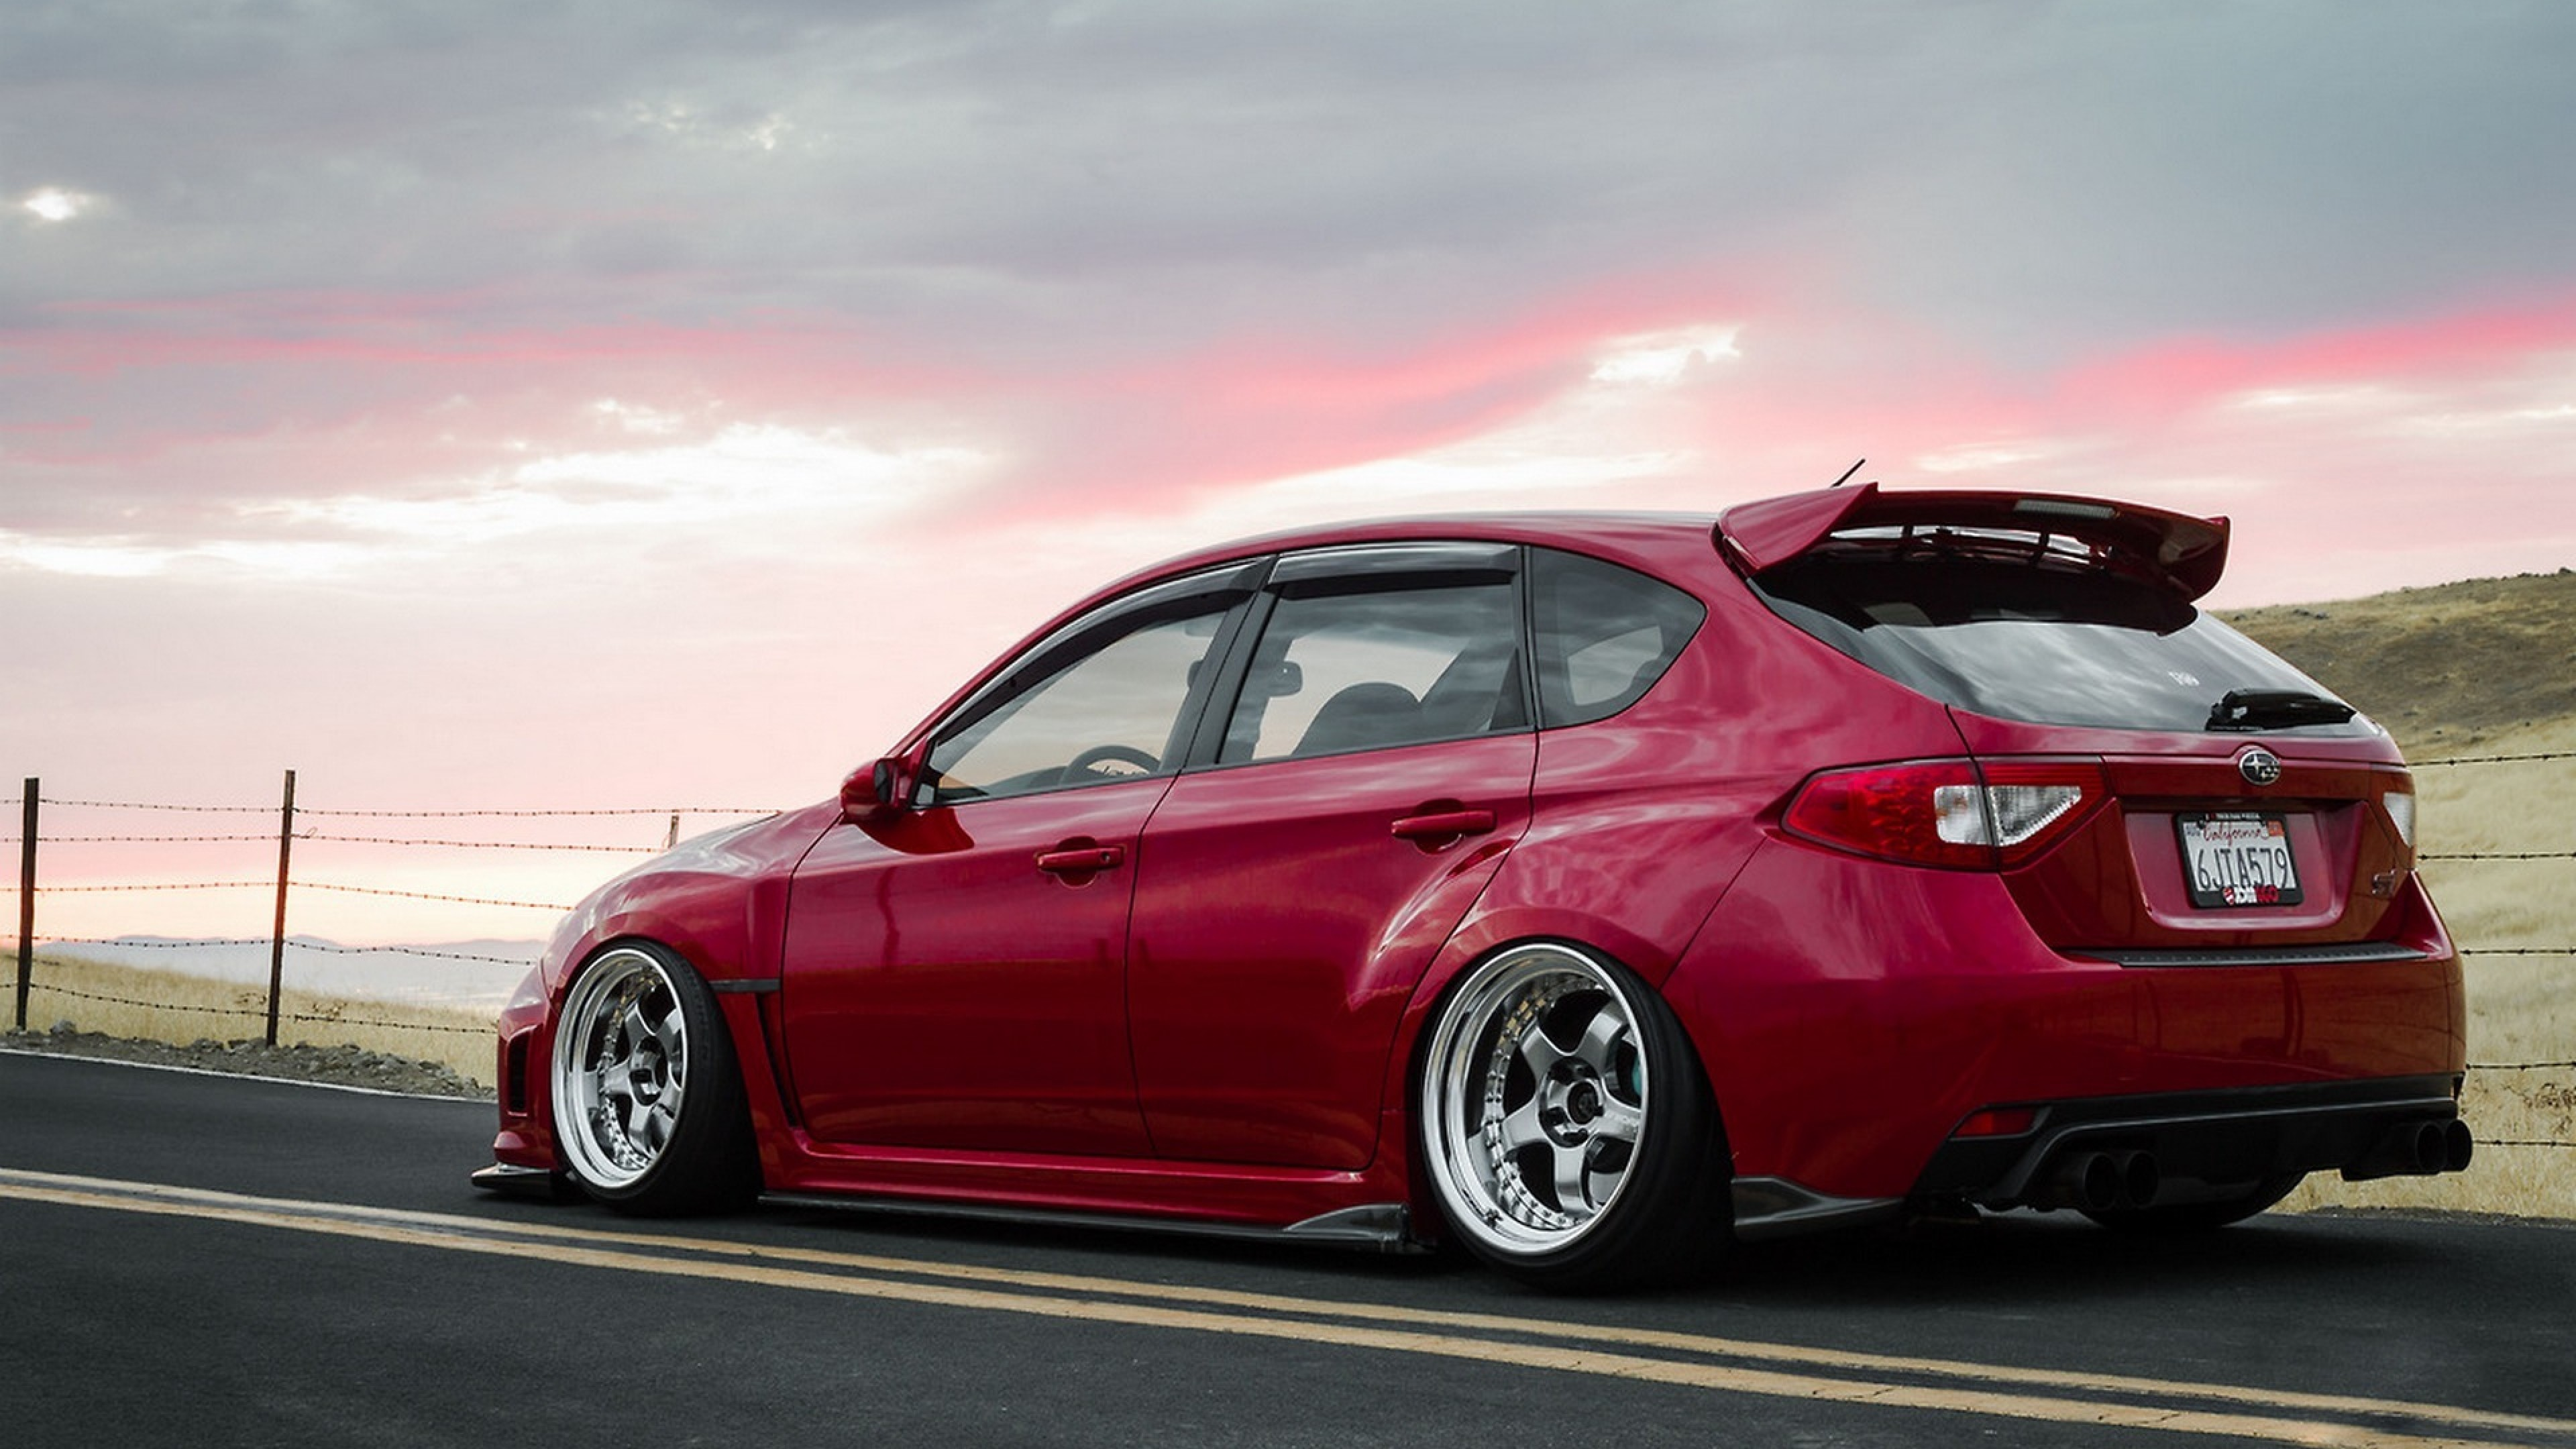 Cars Tuning Subaru Impreza Wrx Jdm Wallpaper: Jdm Wallpapers HD (73+ Images